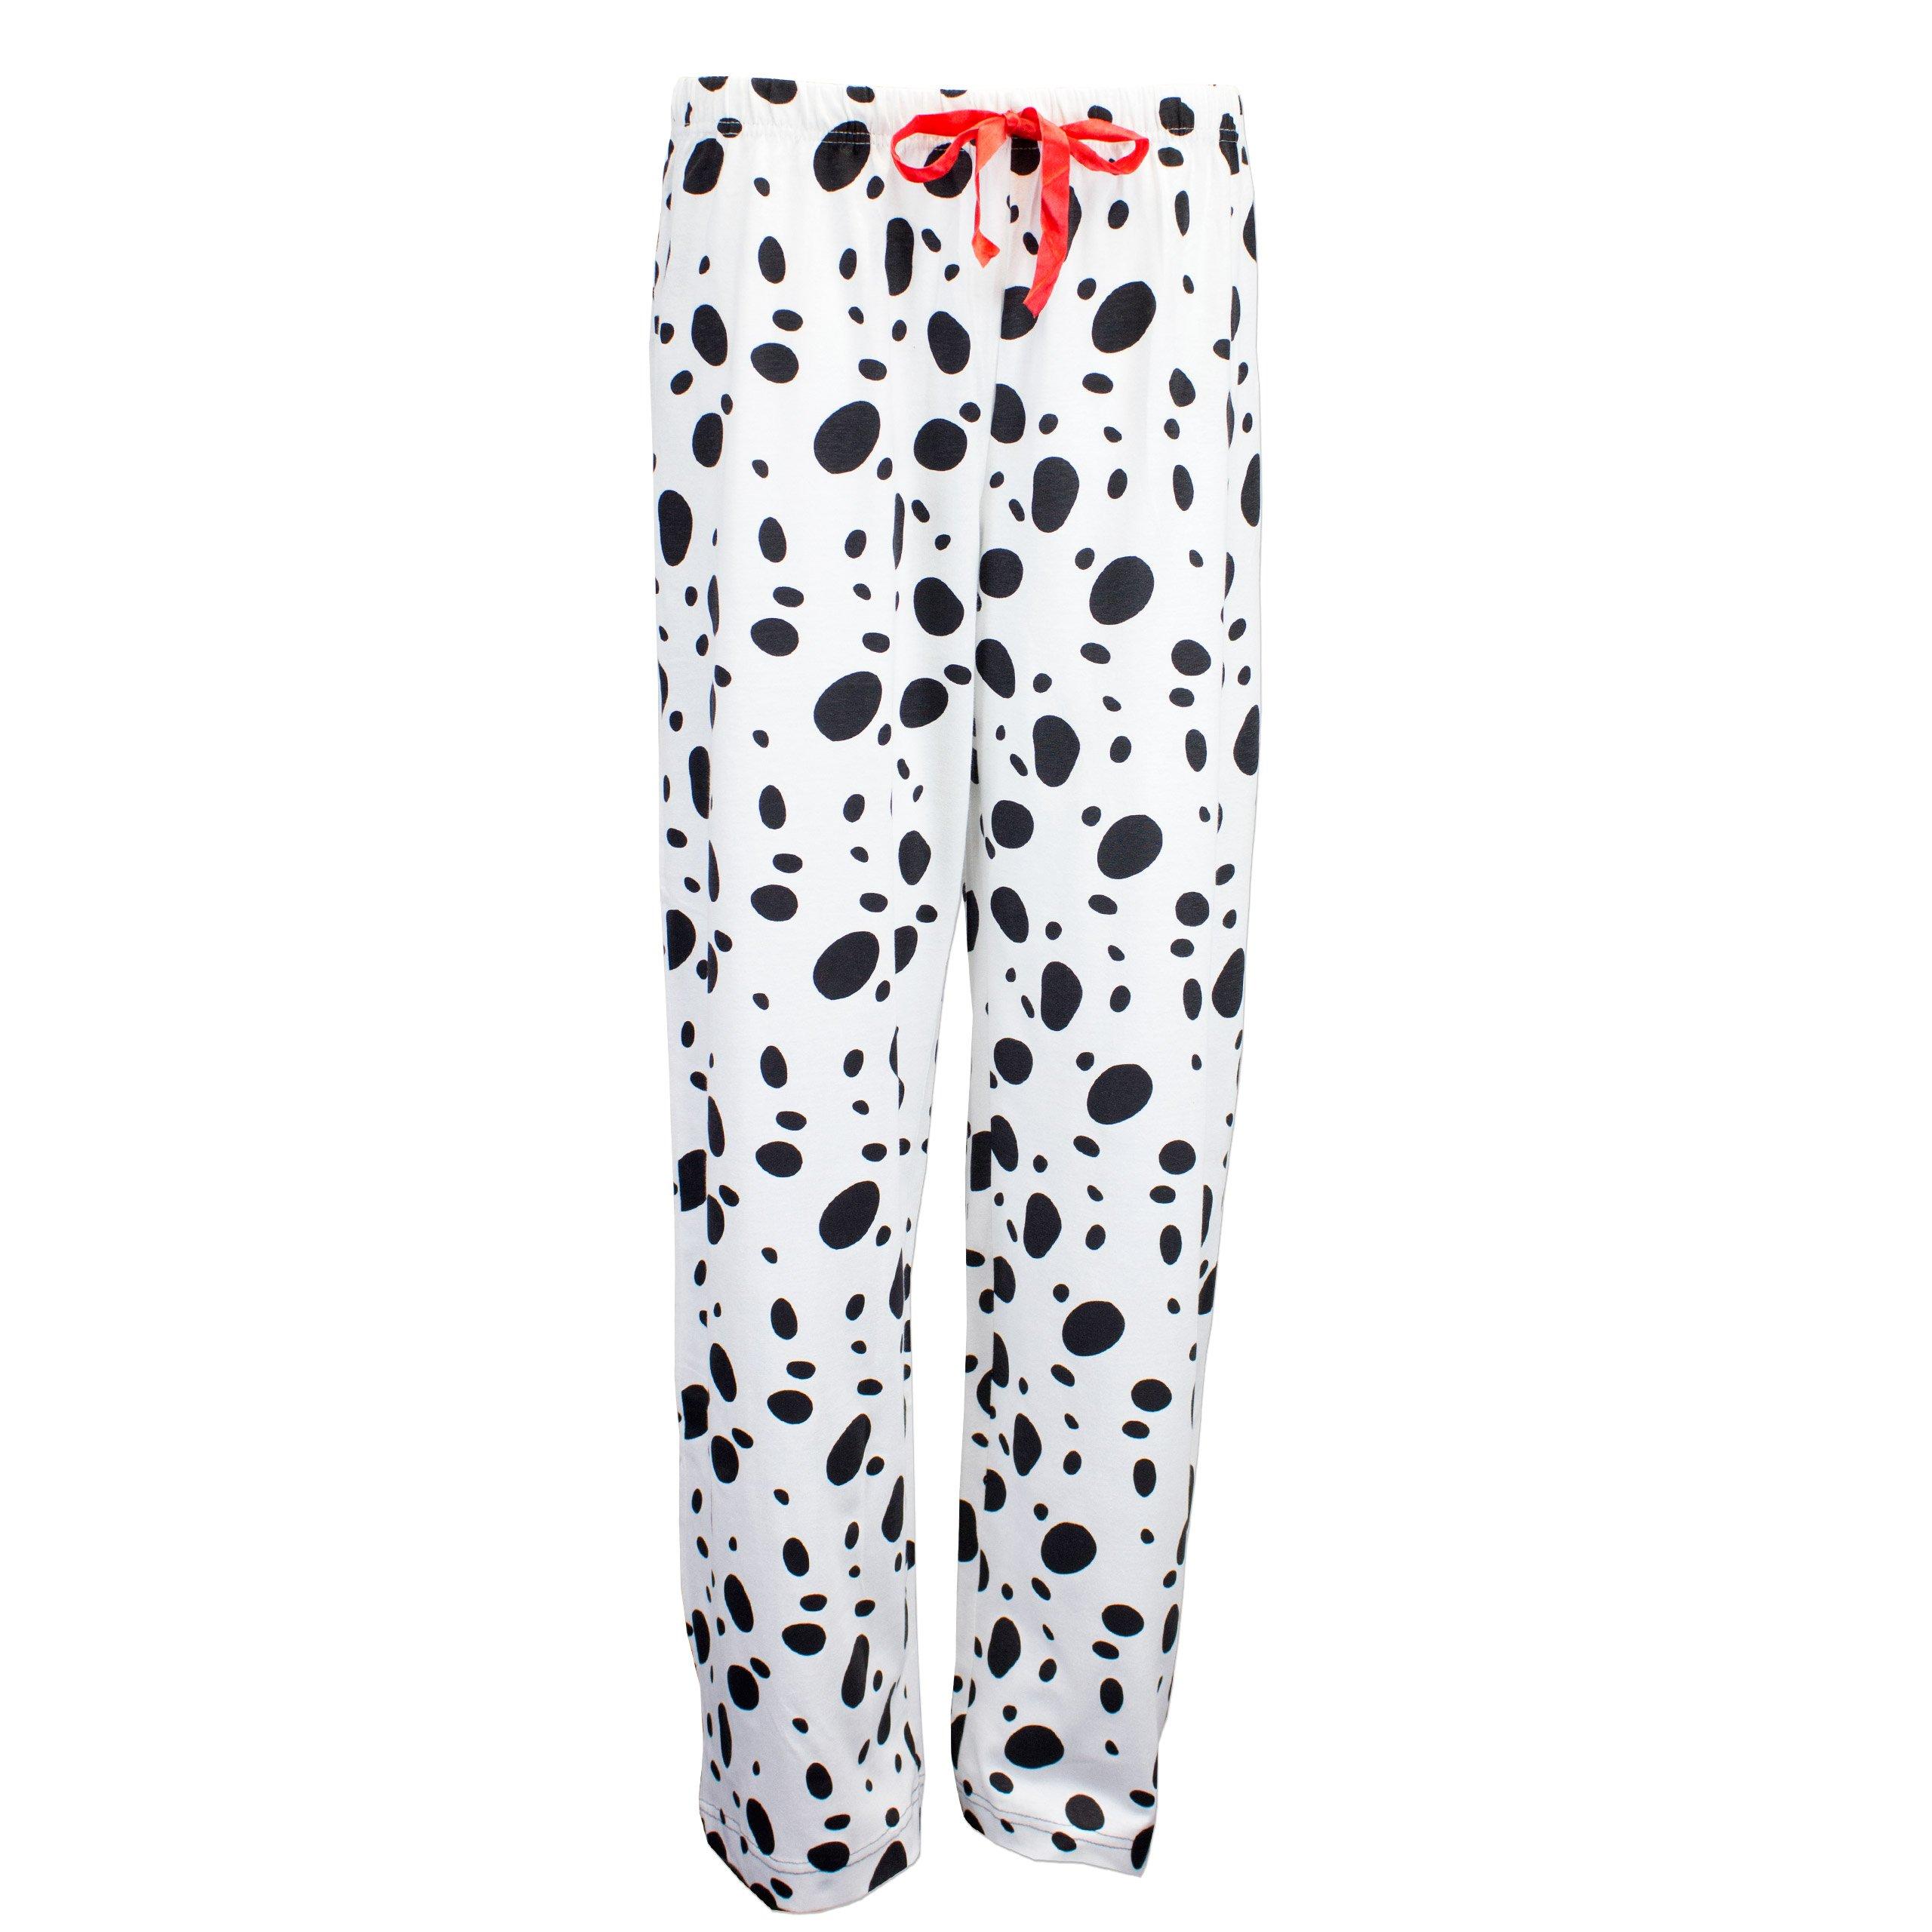 101 Dalmatians Womens' Disney 101 Dalmatians Pajamas White Size Small by Disney (Image #4)